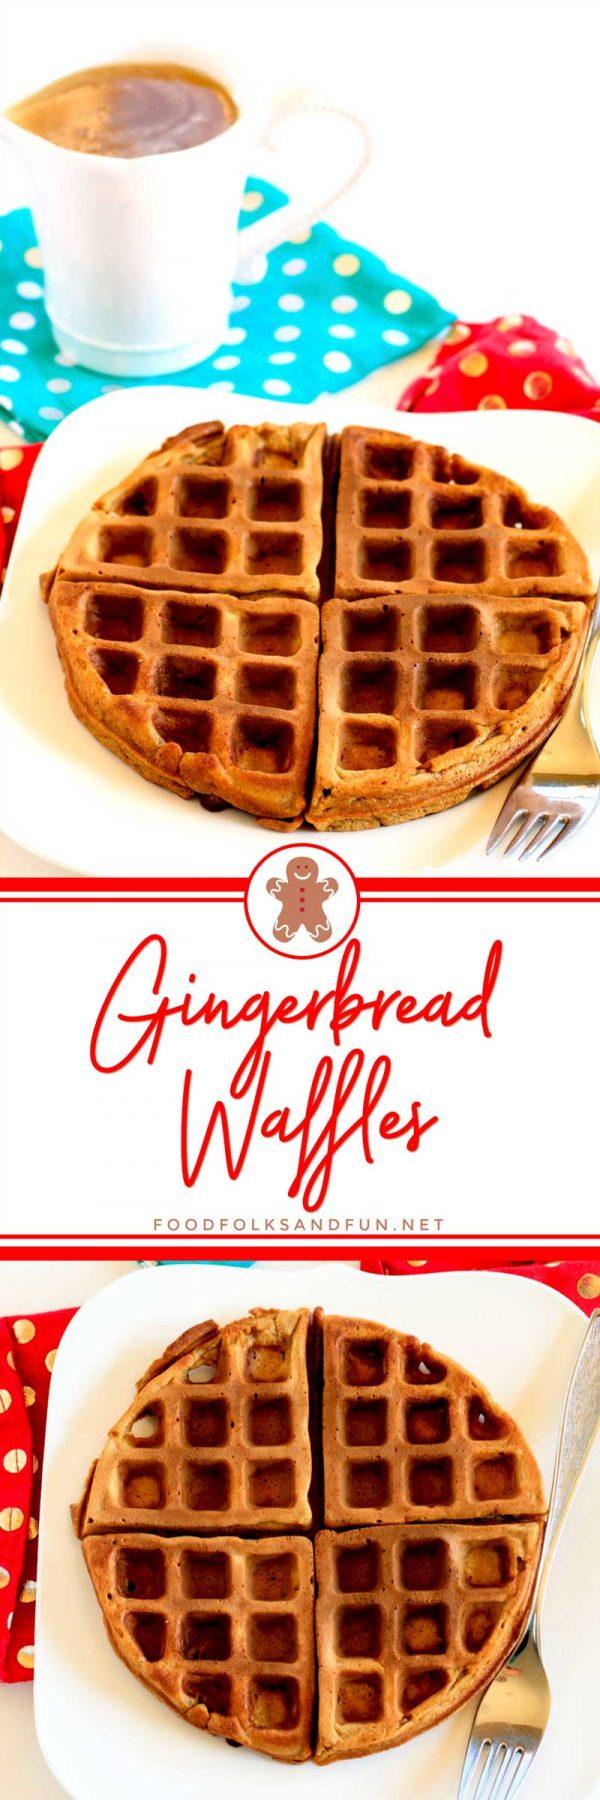 Best-Ever Gingerbread Waffles